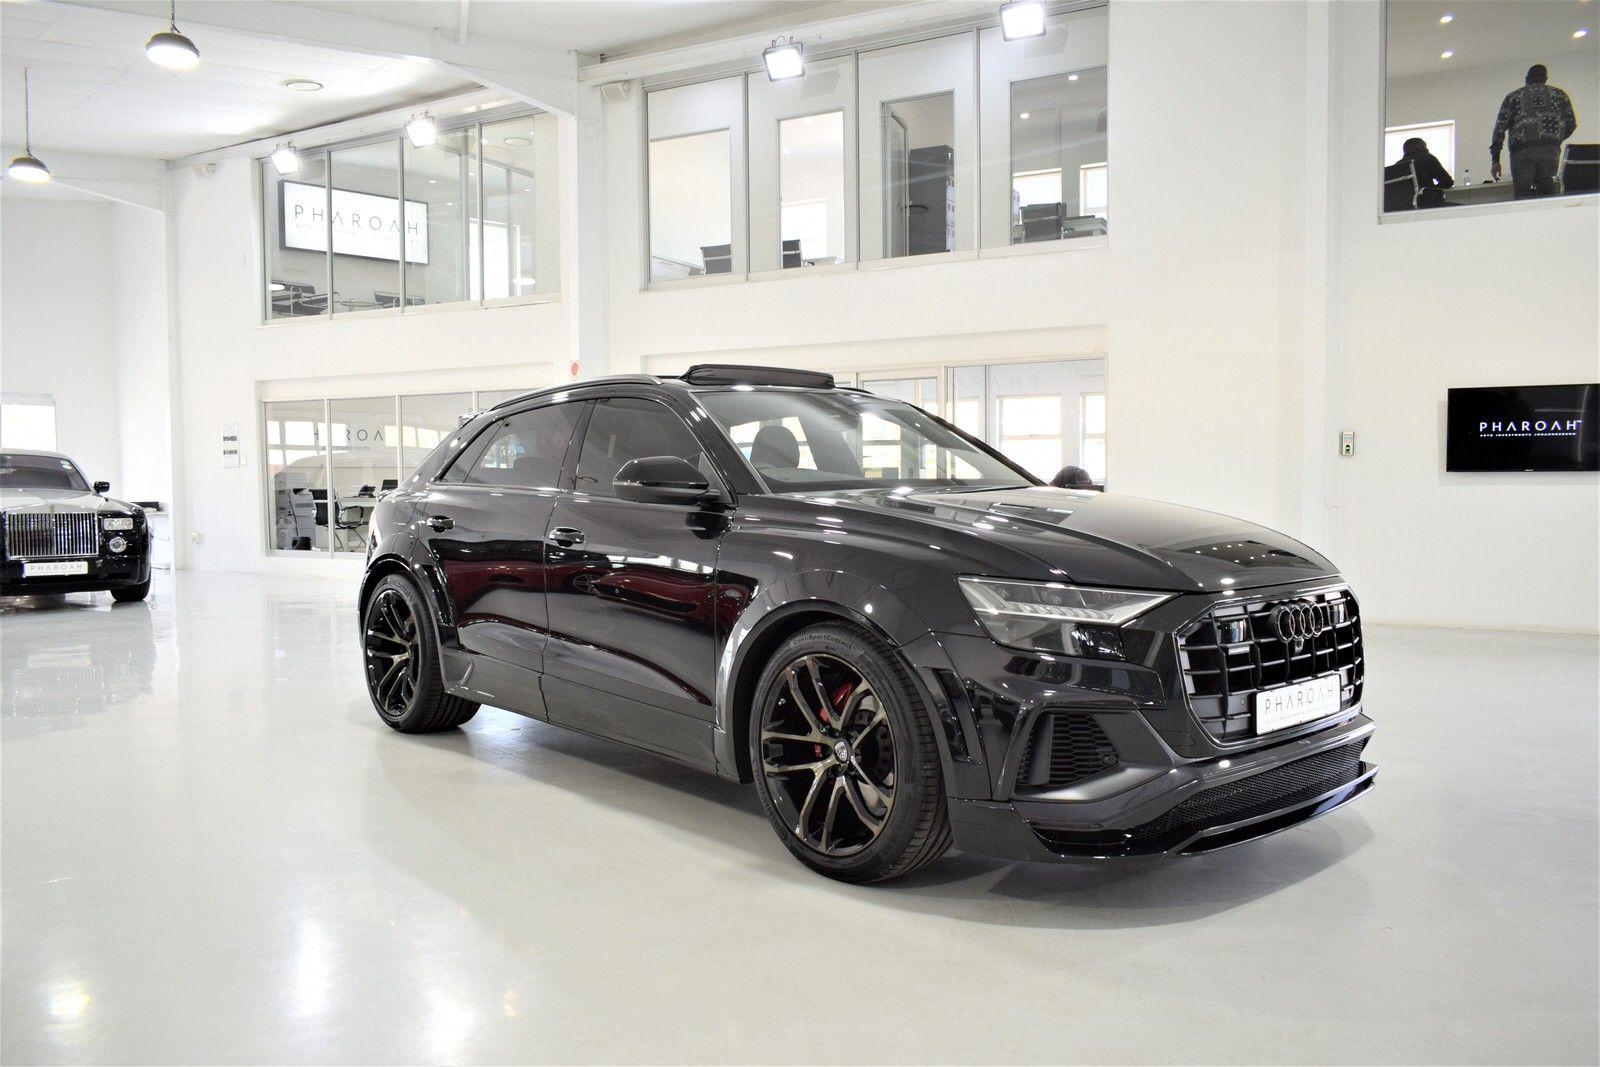 2019 Audi Q8 By Lumma Design Lumma Clr 8s Audi Q8 55tfsi Quattro Lumma Clr 8s In 2020 Audi Sports Car Black